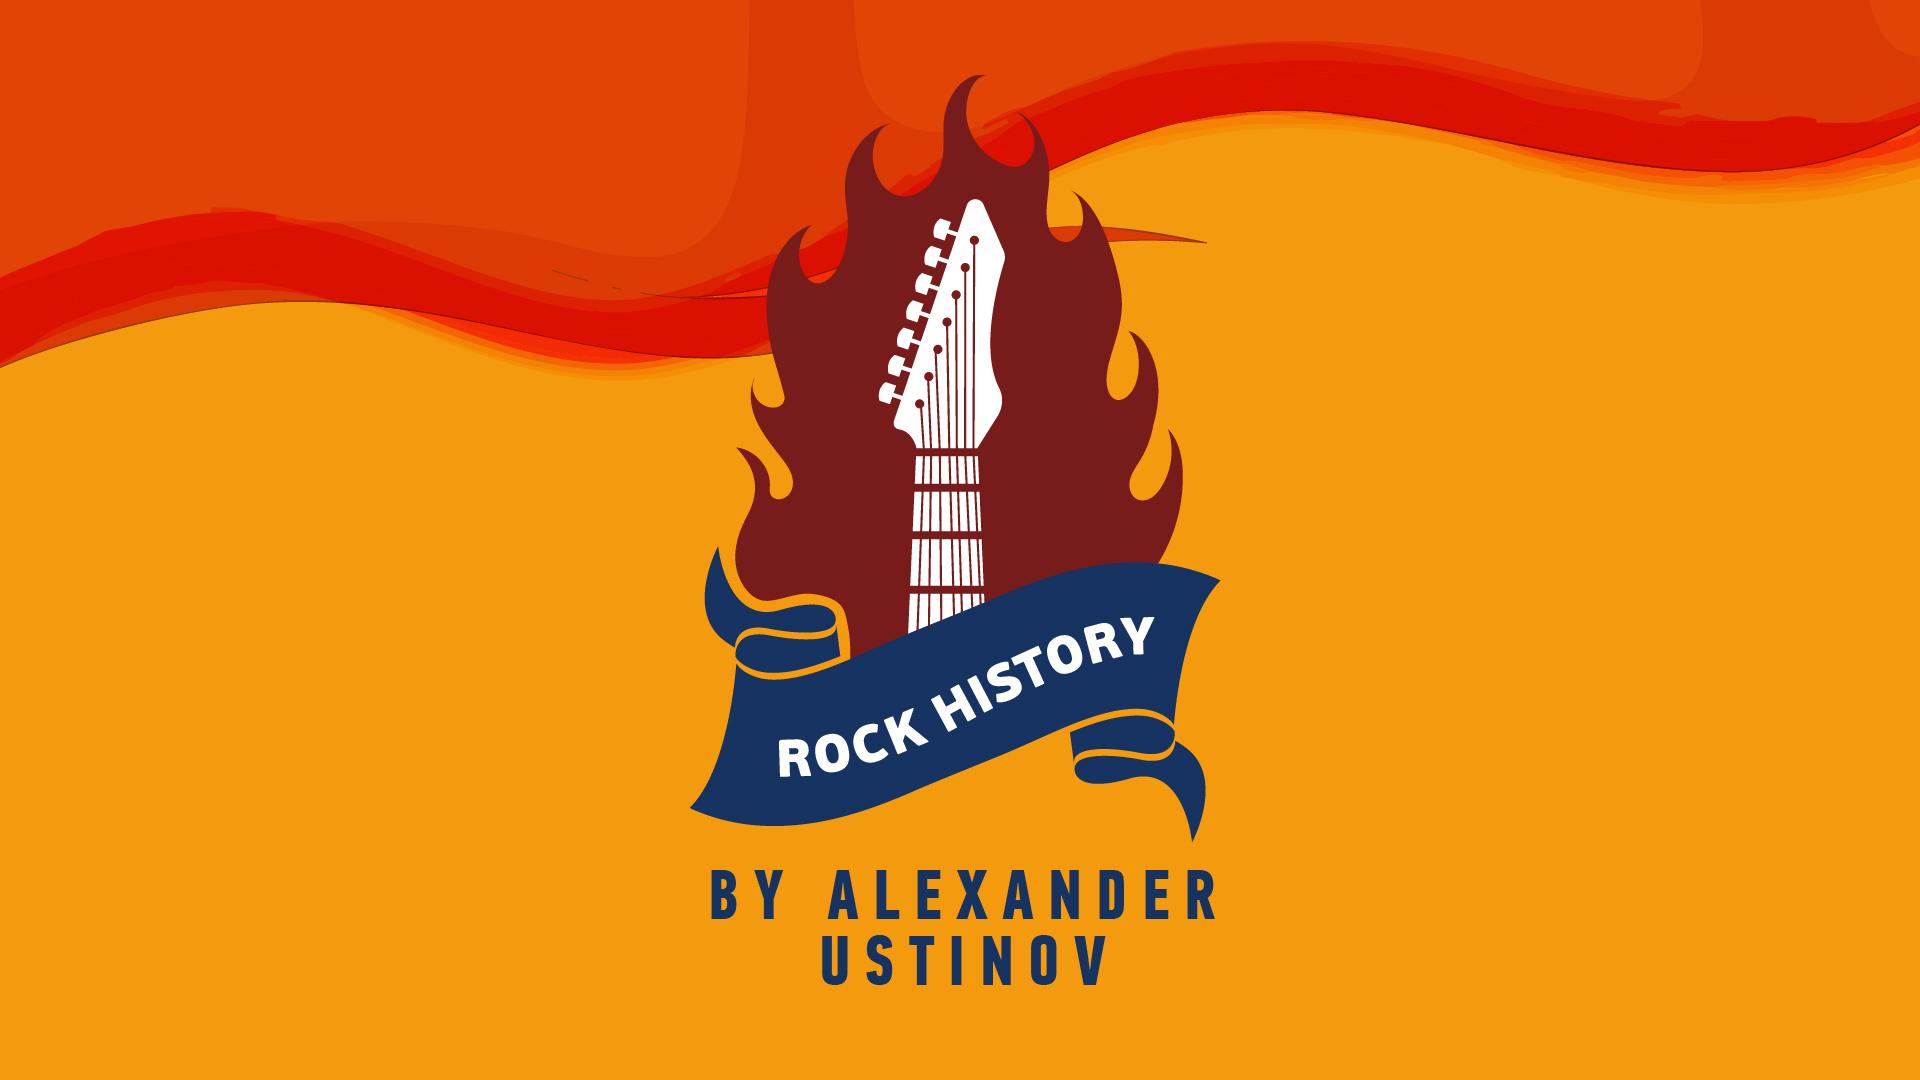 Rock History by Alexander Ustinov